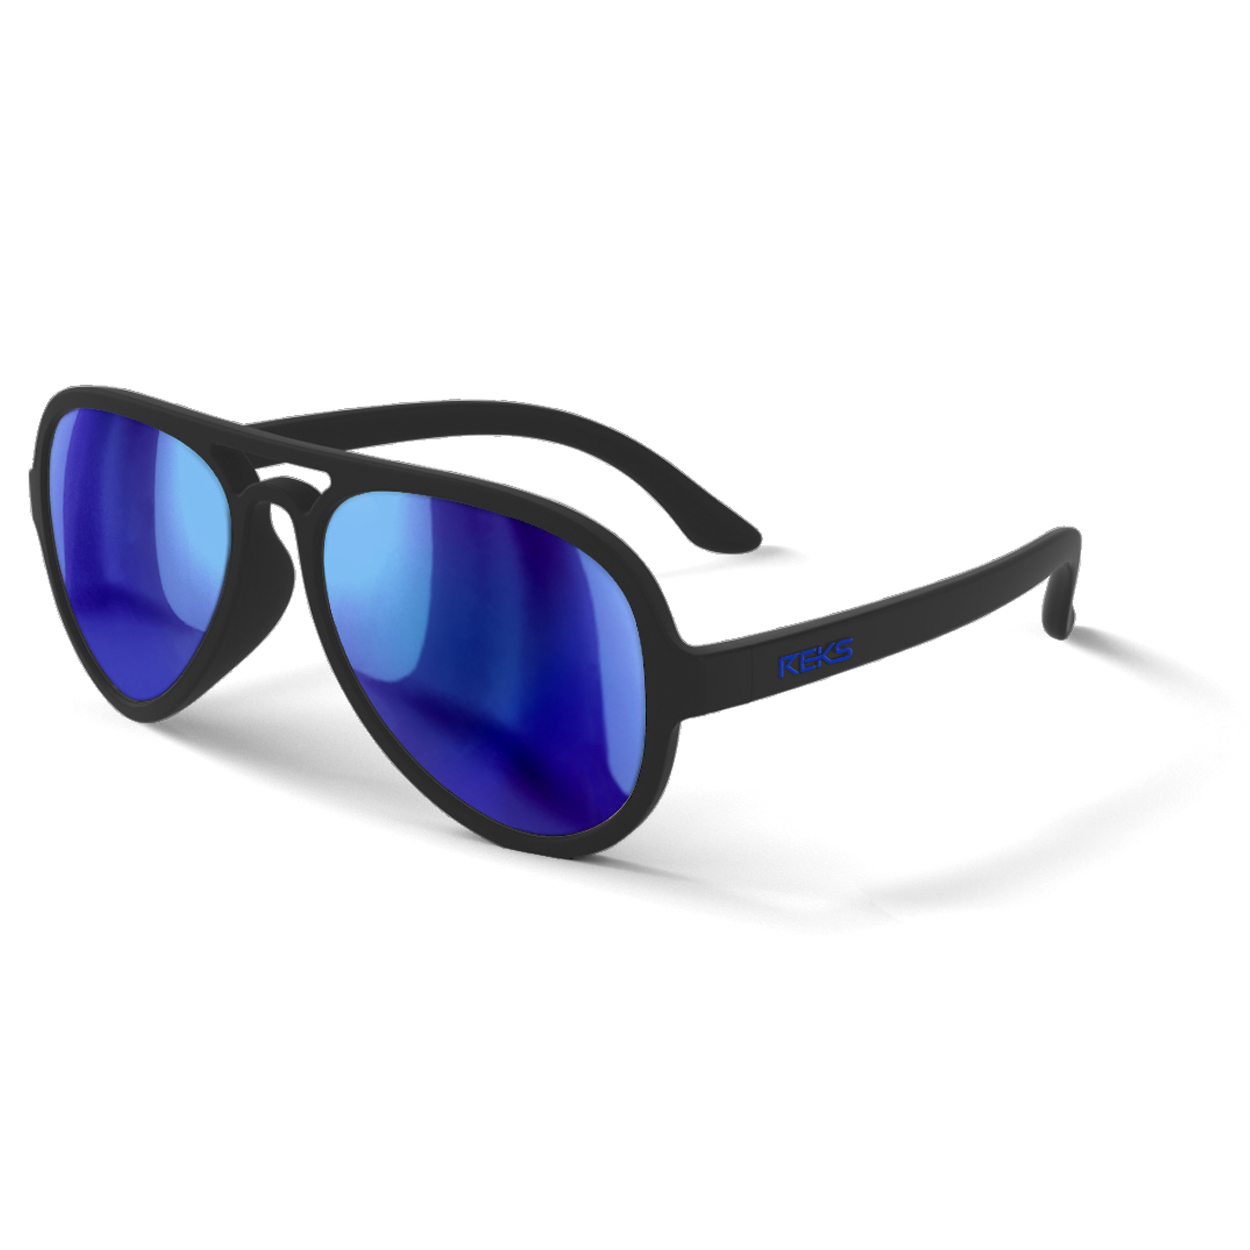 a425cb94ba Reks Optics Aviator Golf Sunglasses